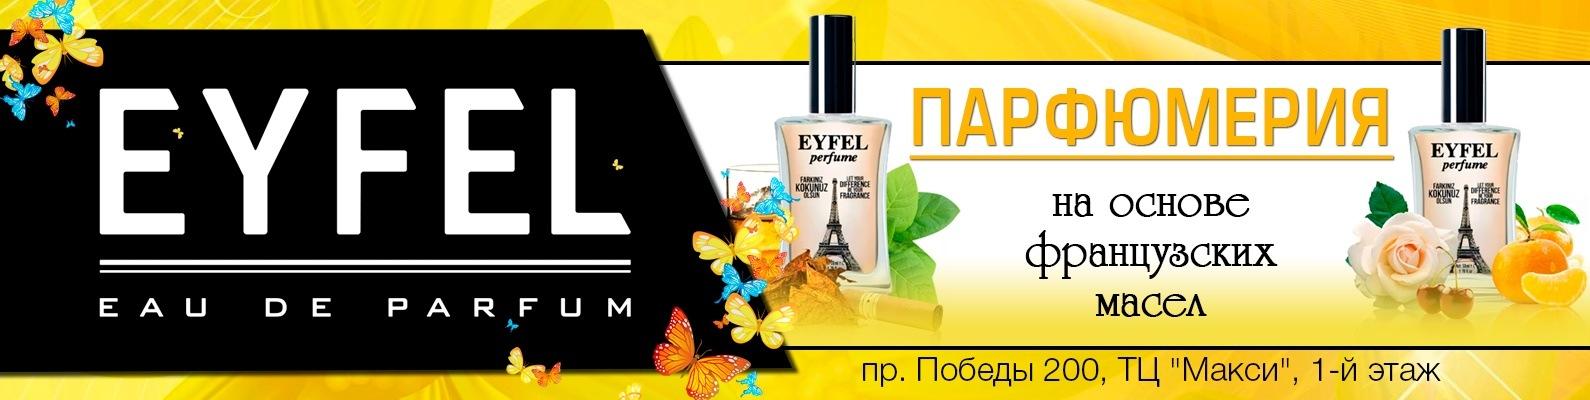 Eyfel Perfume череповец парфюмерия вконтакте